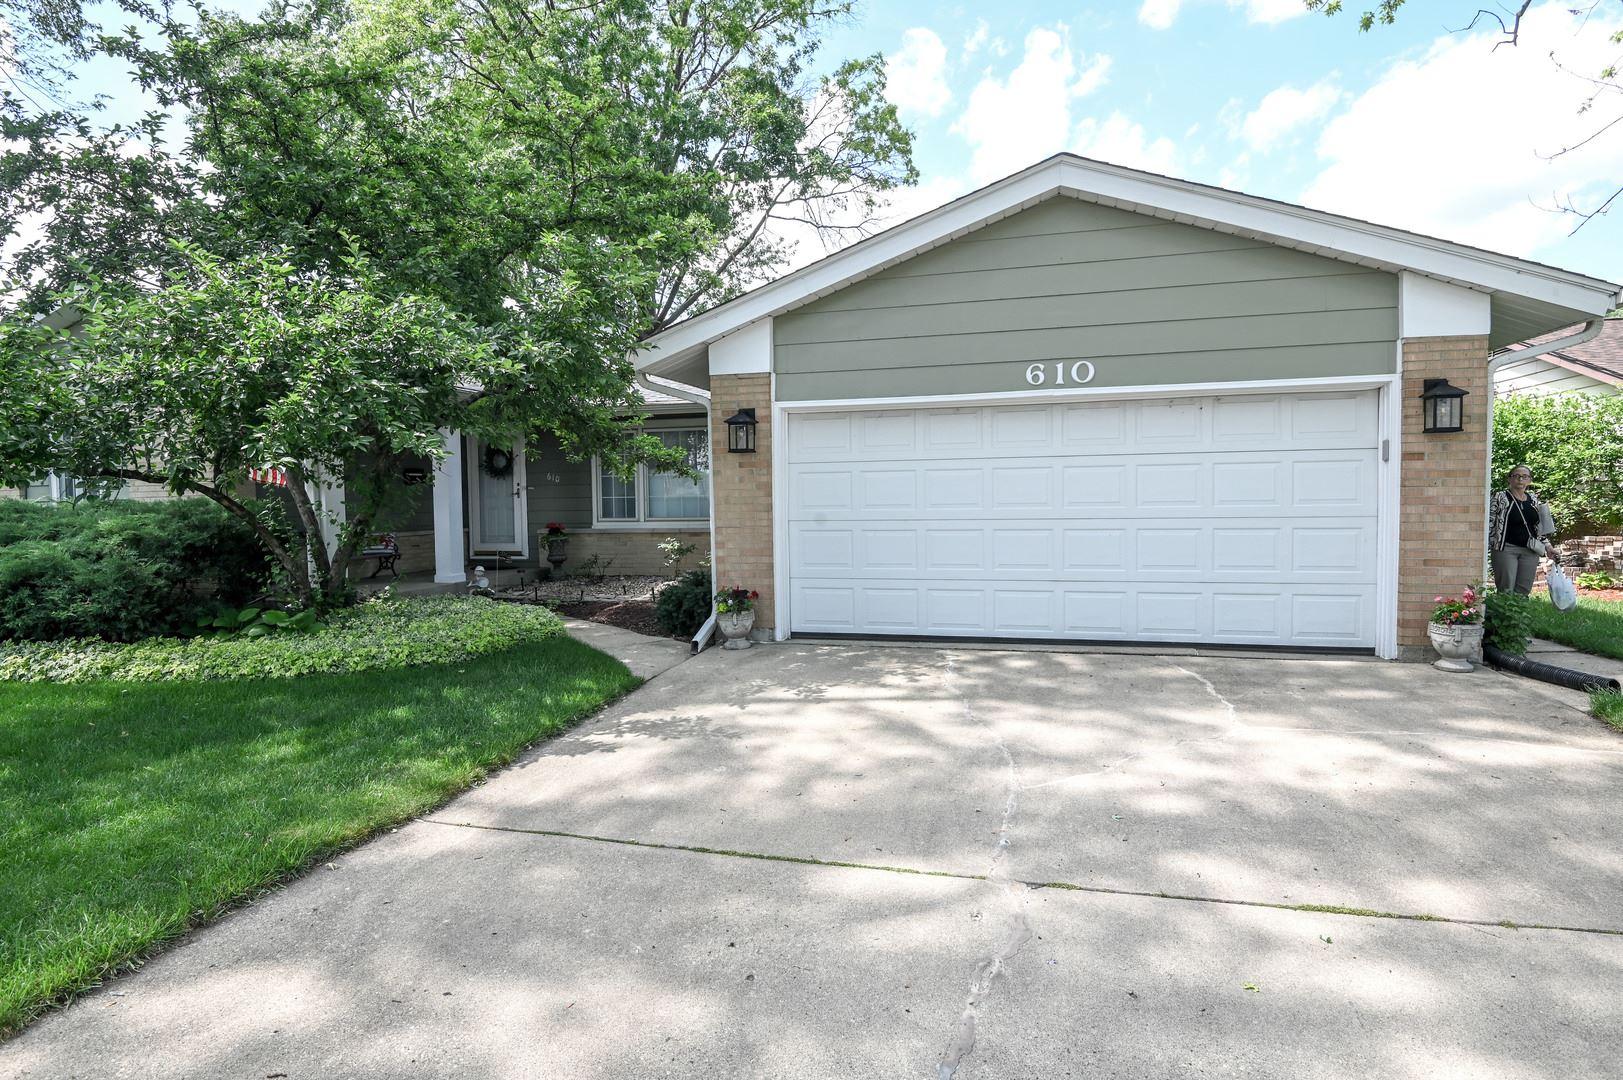 610 Walnut Lane, Elk Grove Village, IL 60007 - #: 11135595